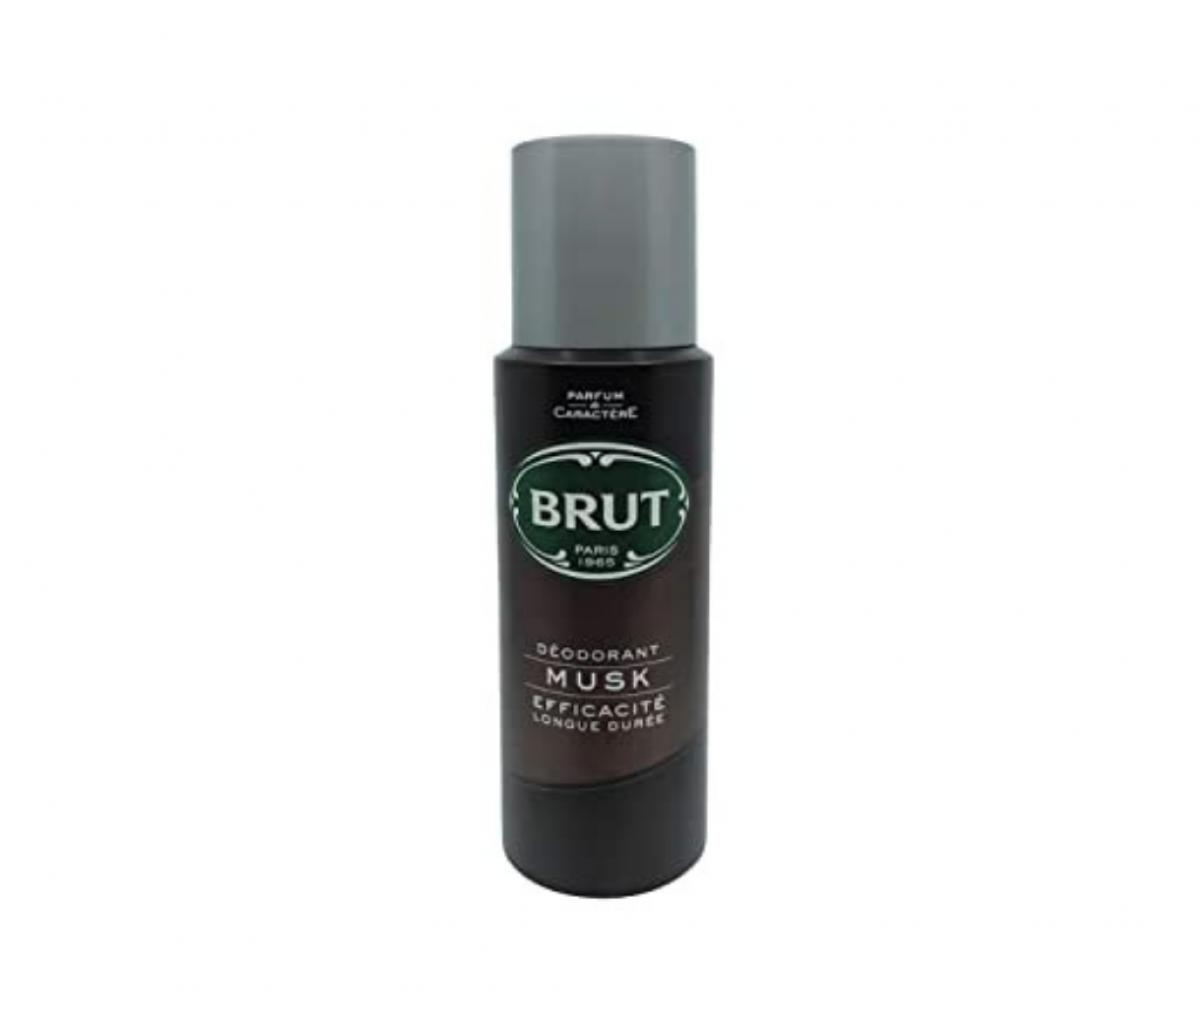 Brut Deo 200ml Musk Black